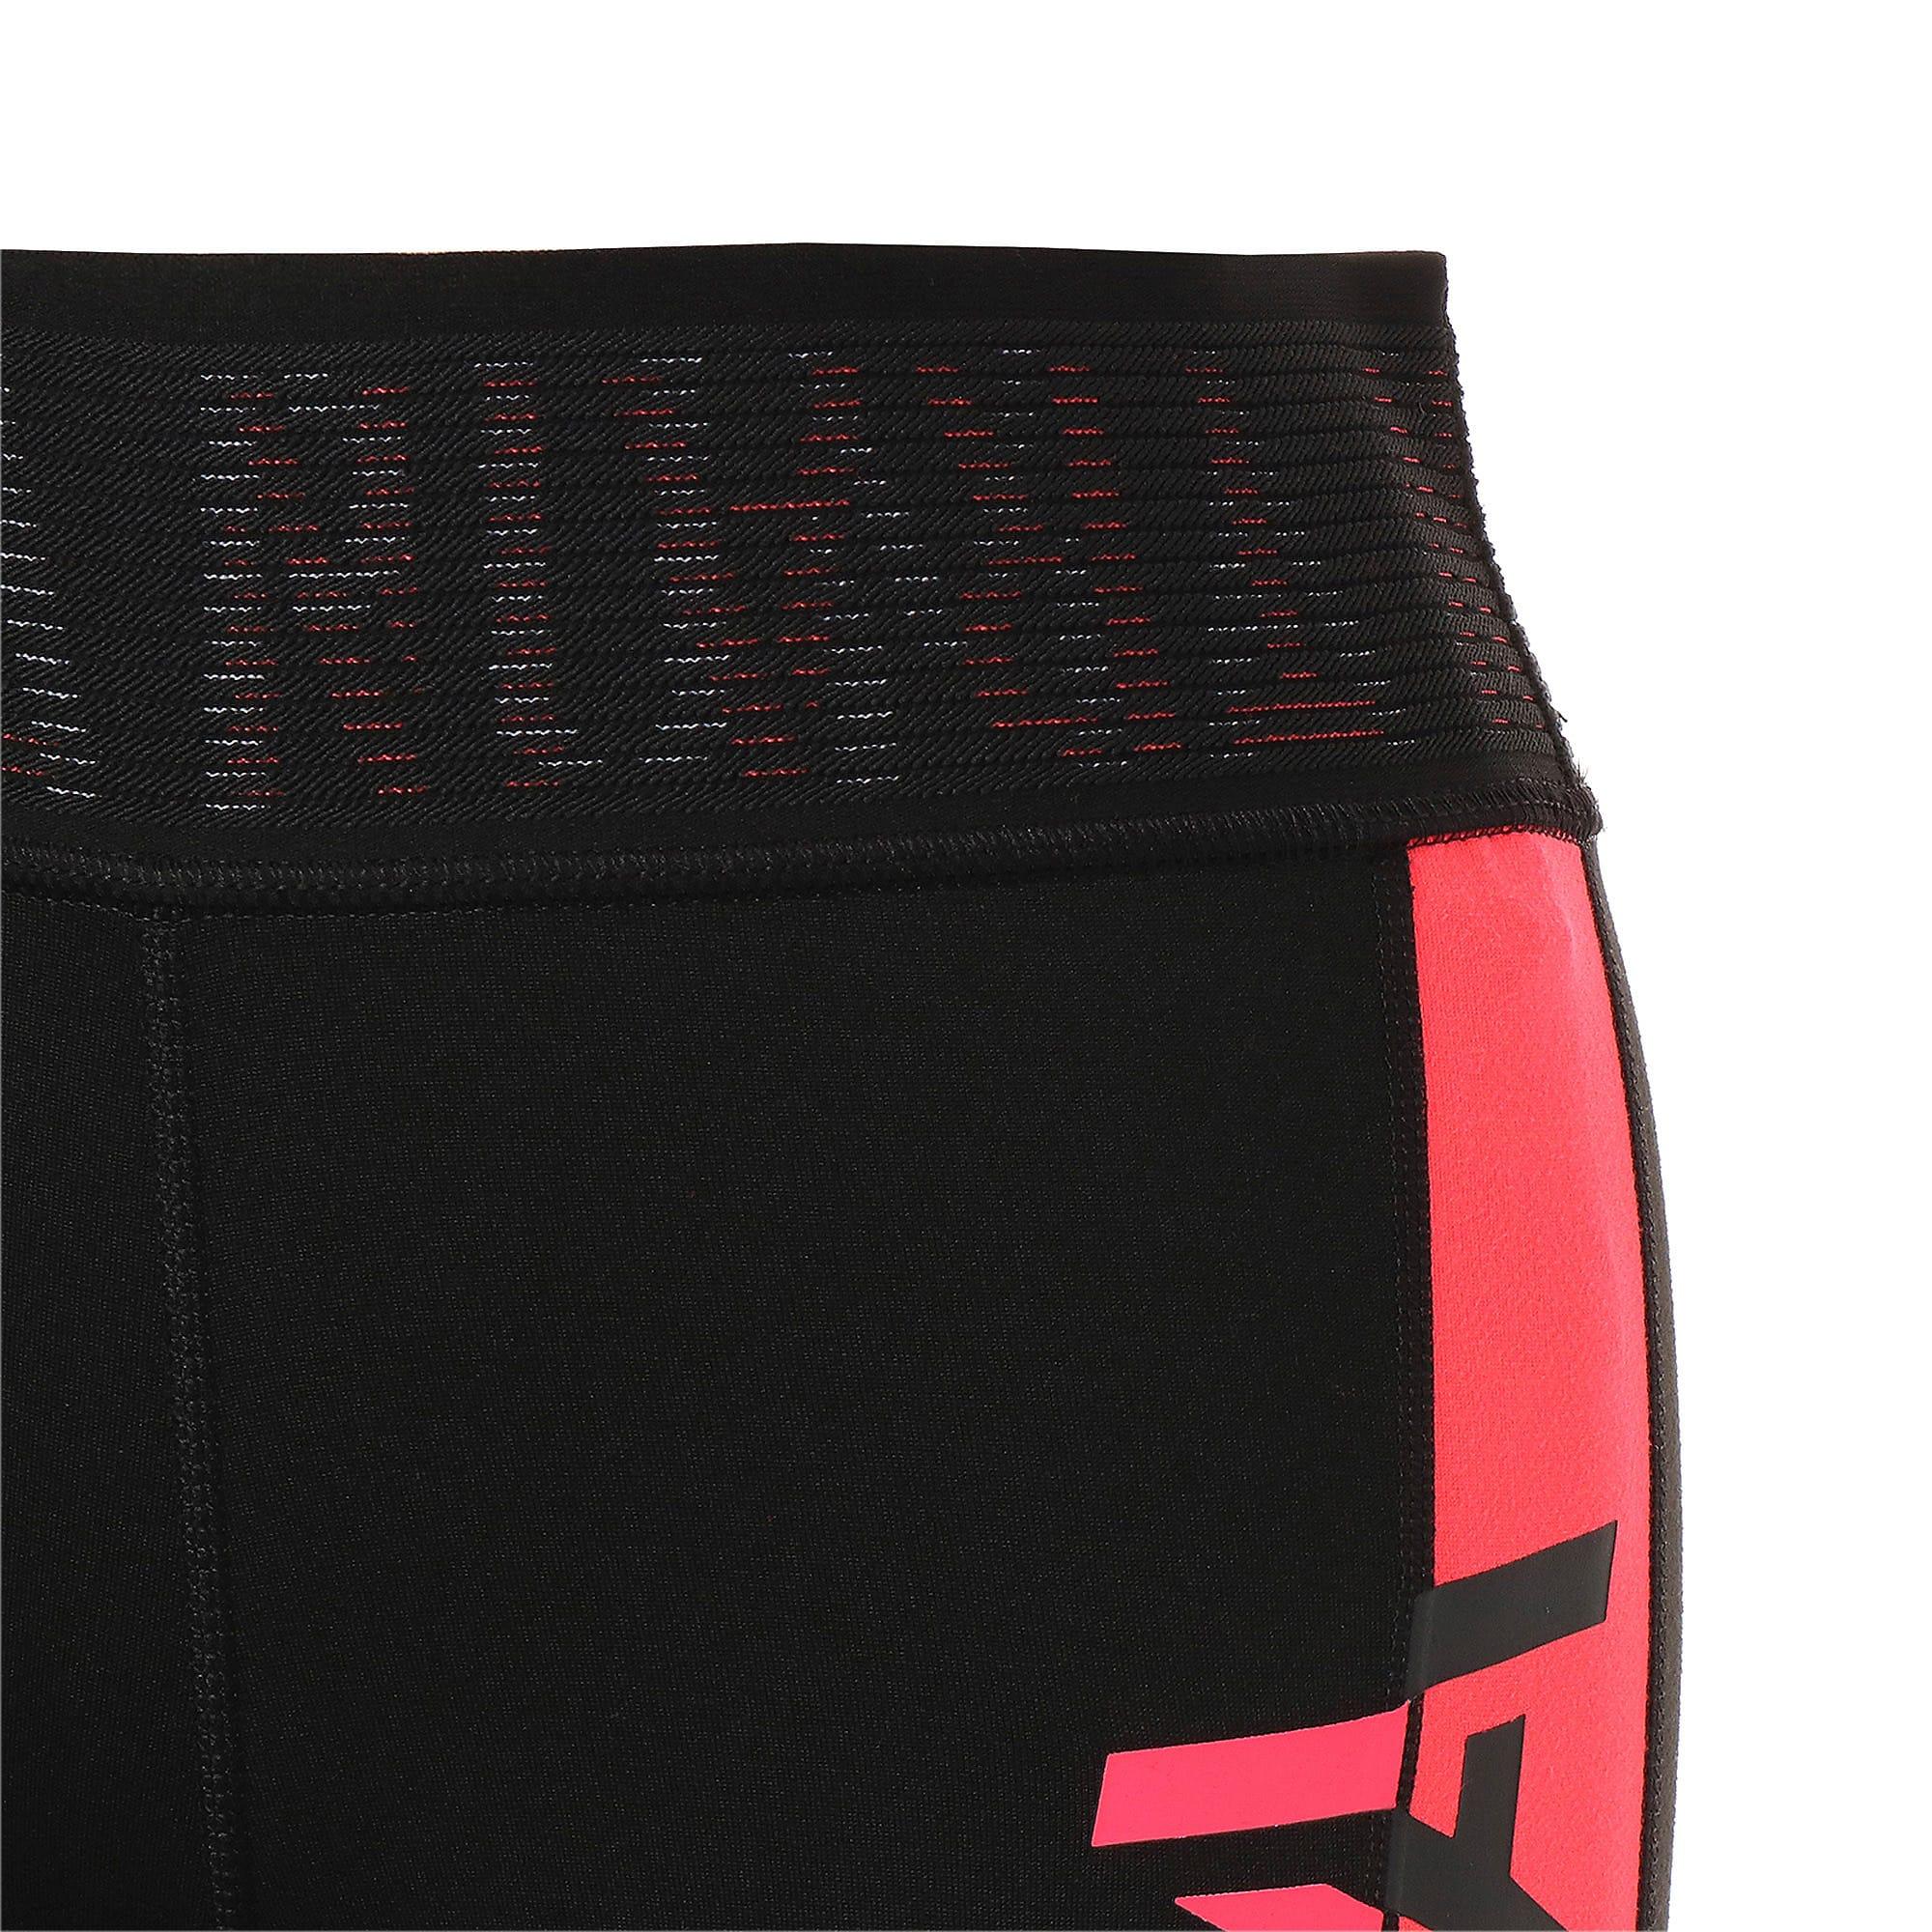 Thumbnail 8 of BE BOLD ウィメンズ トレーニング ロゴ 7/8タイツ, Puma Black-Pink Alert, medium-JPN